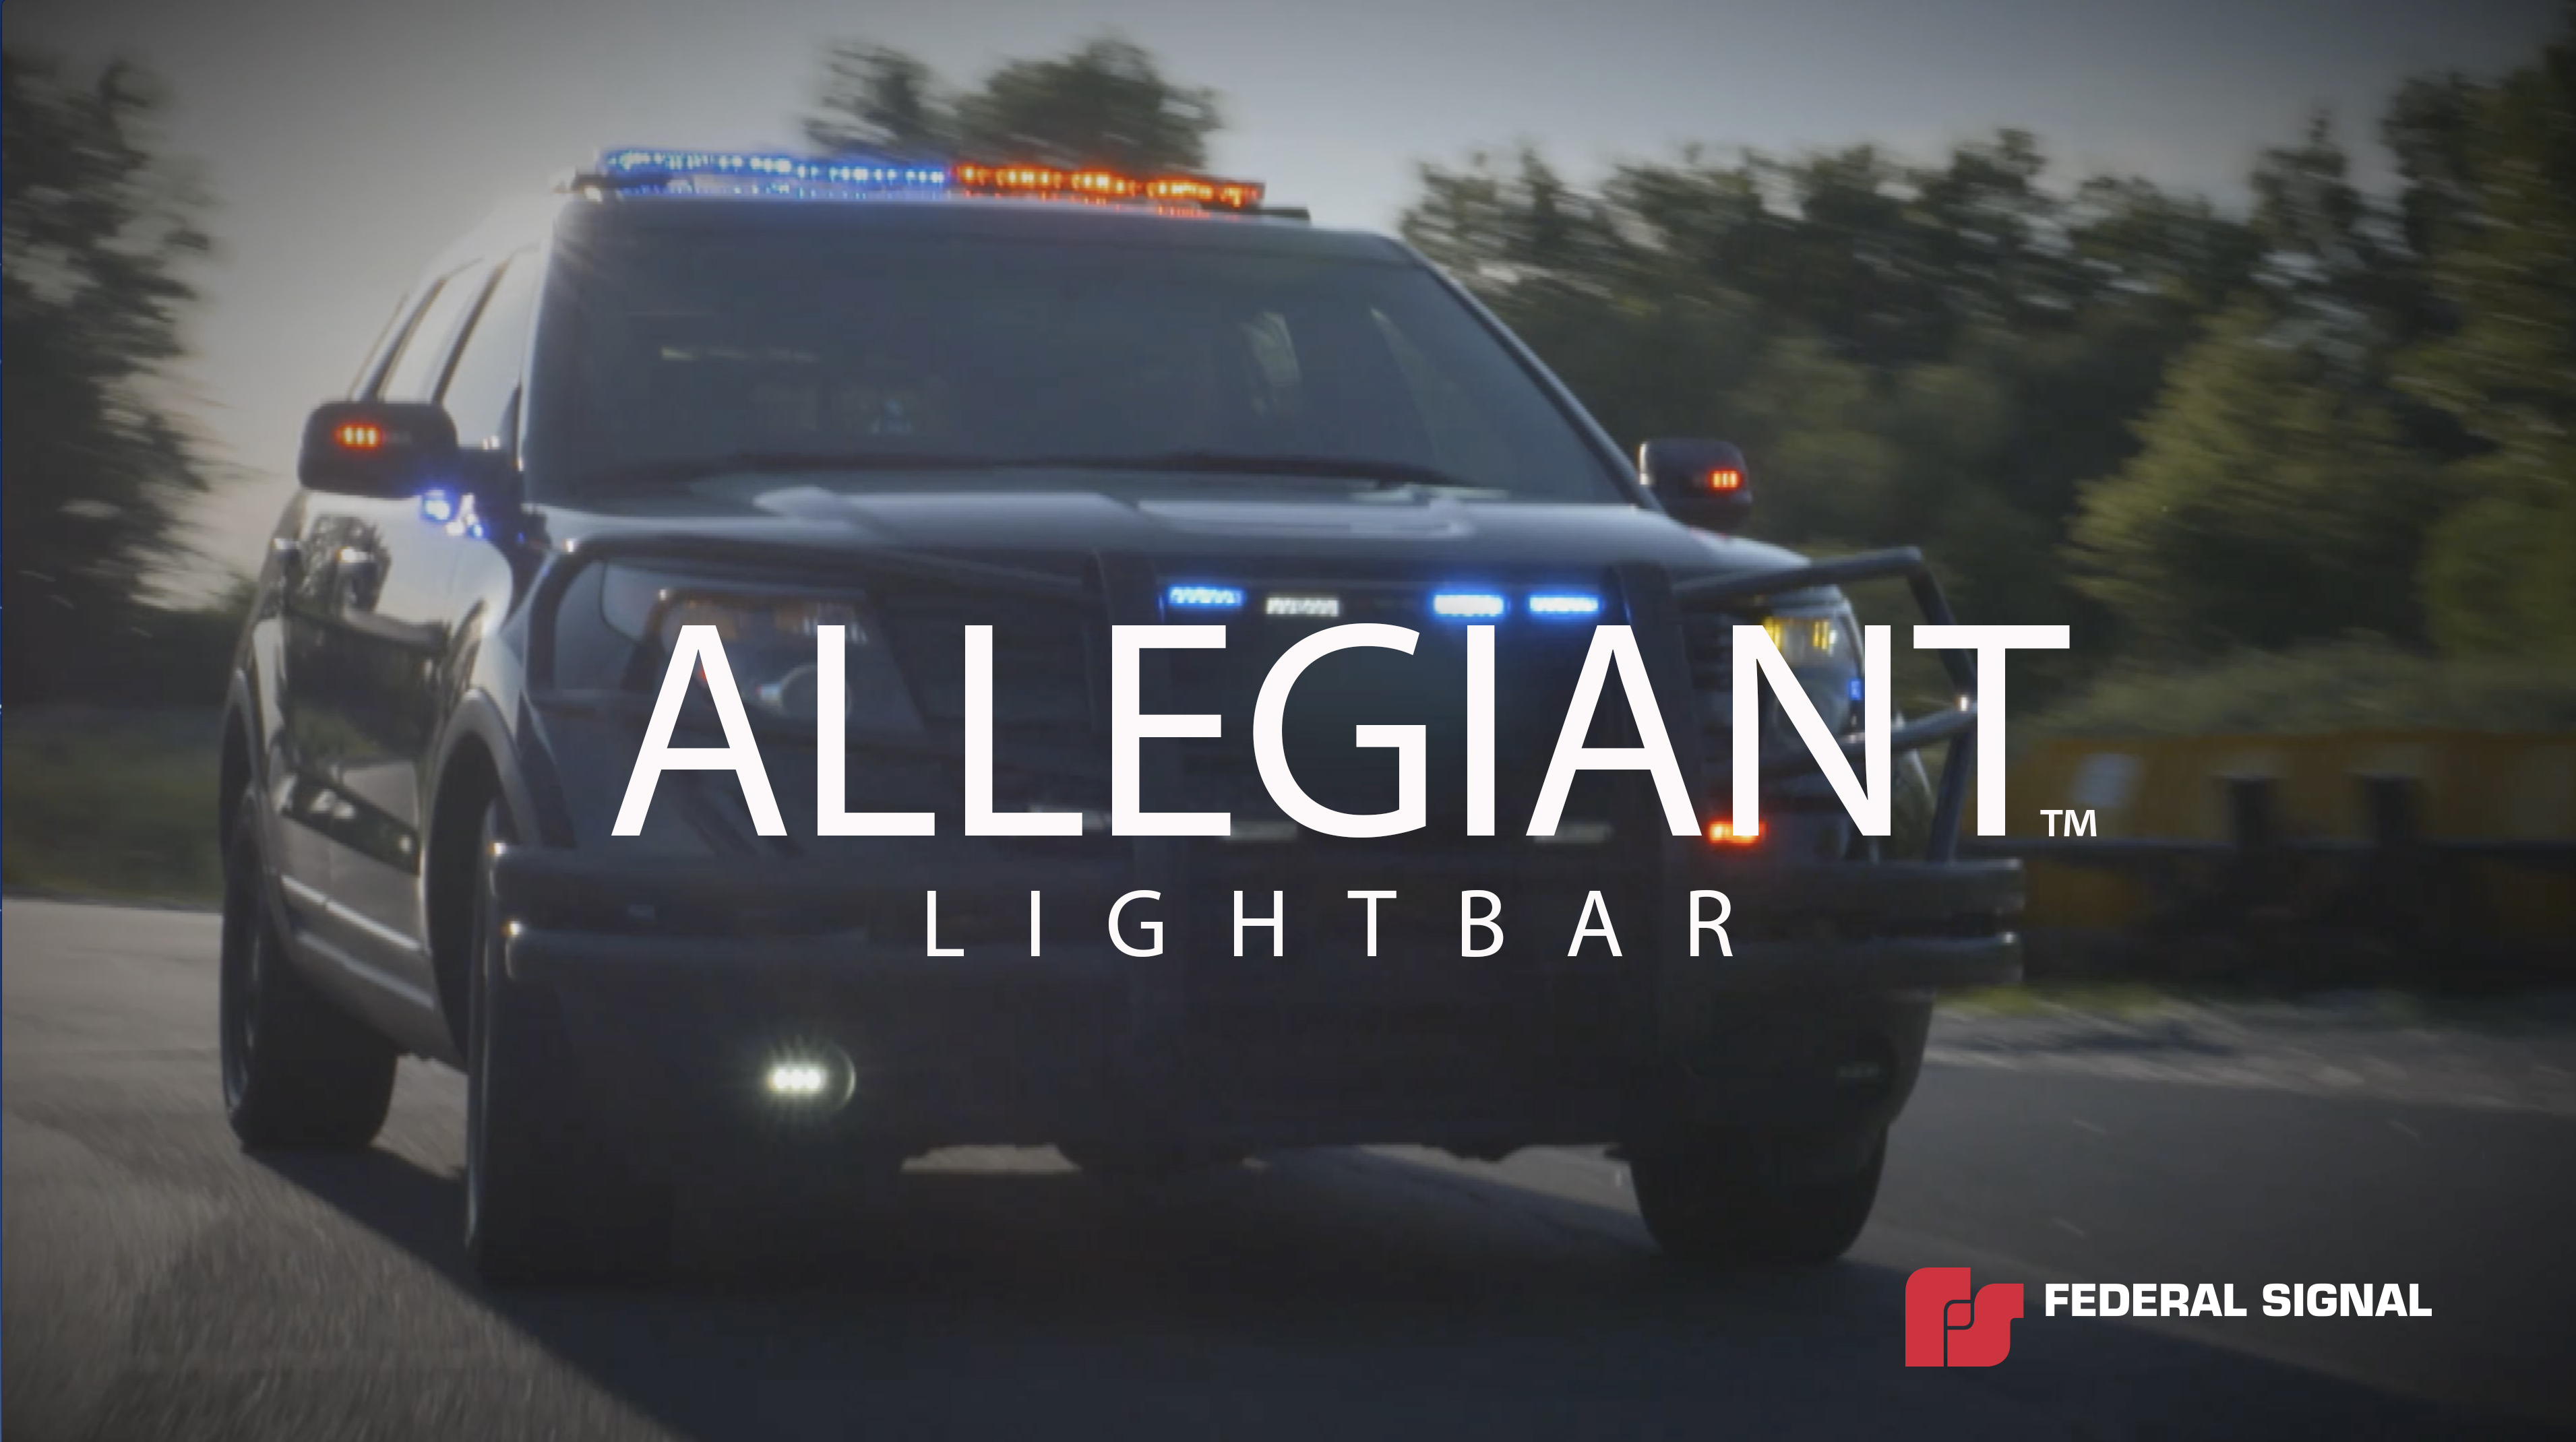 Allegiant police lightbar (Spanish) | Federal Signal